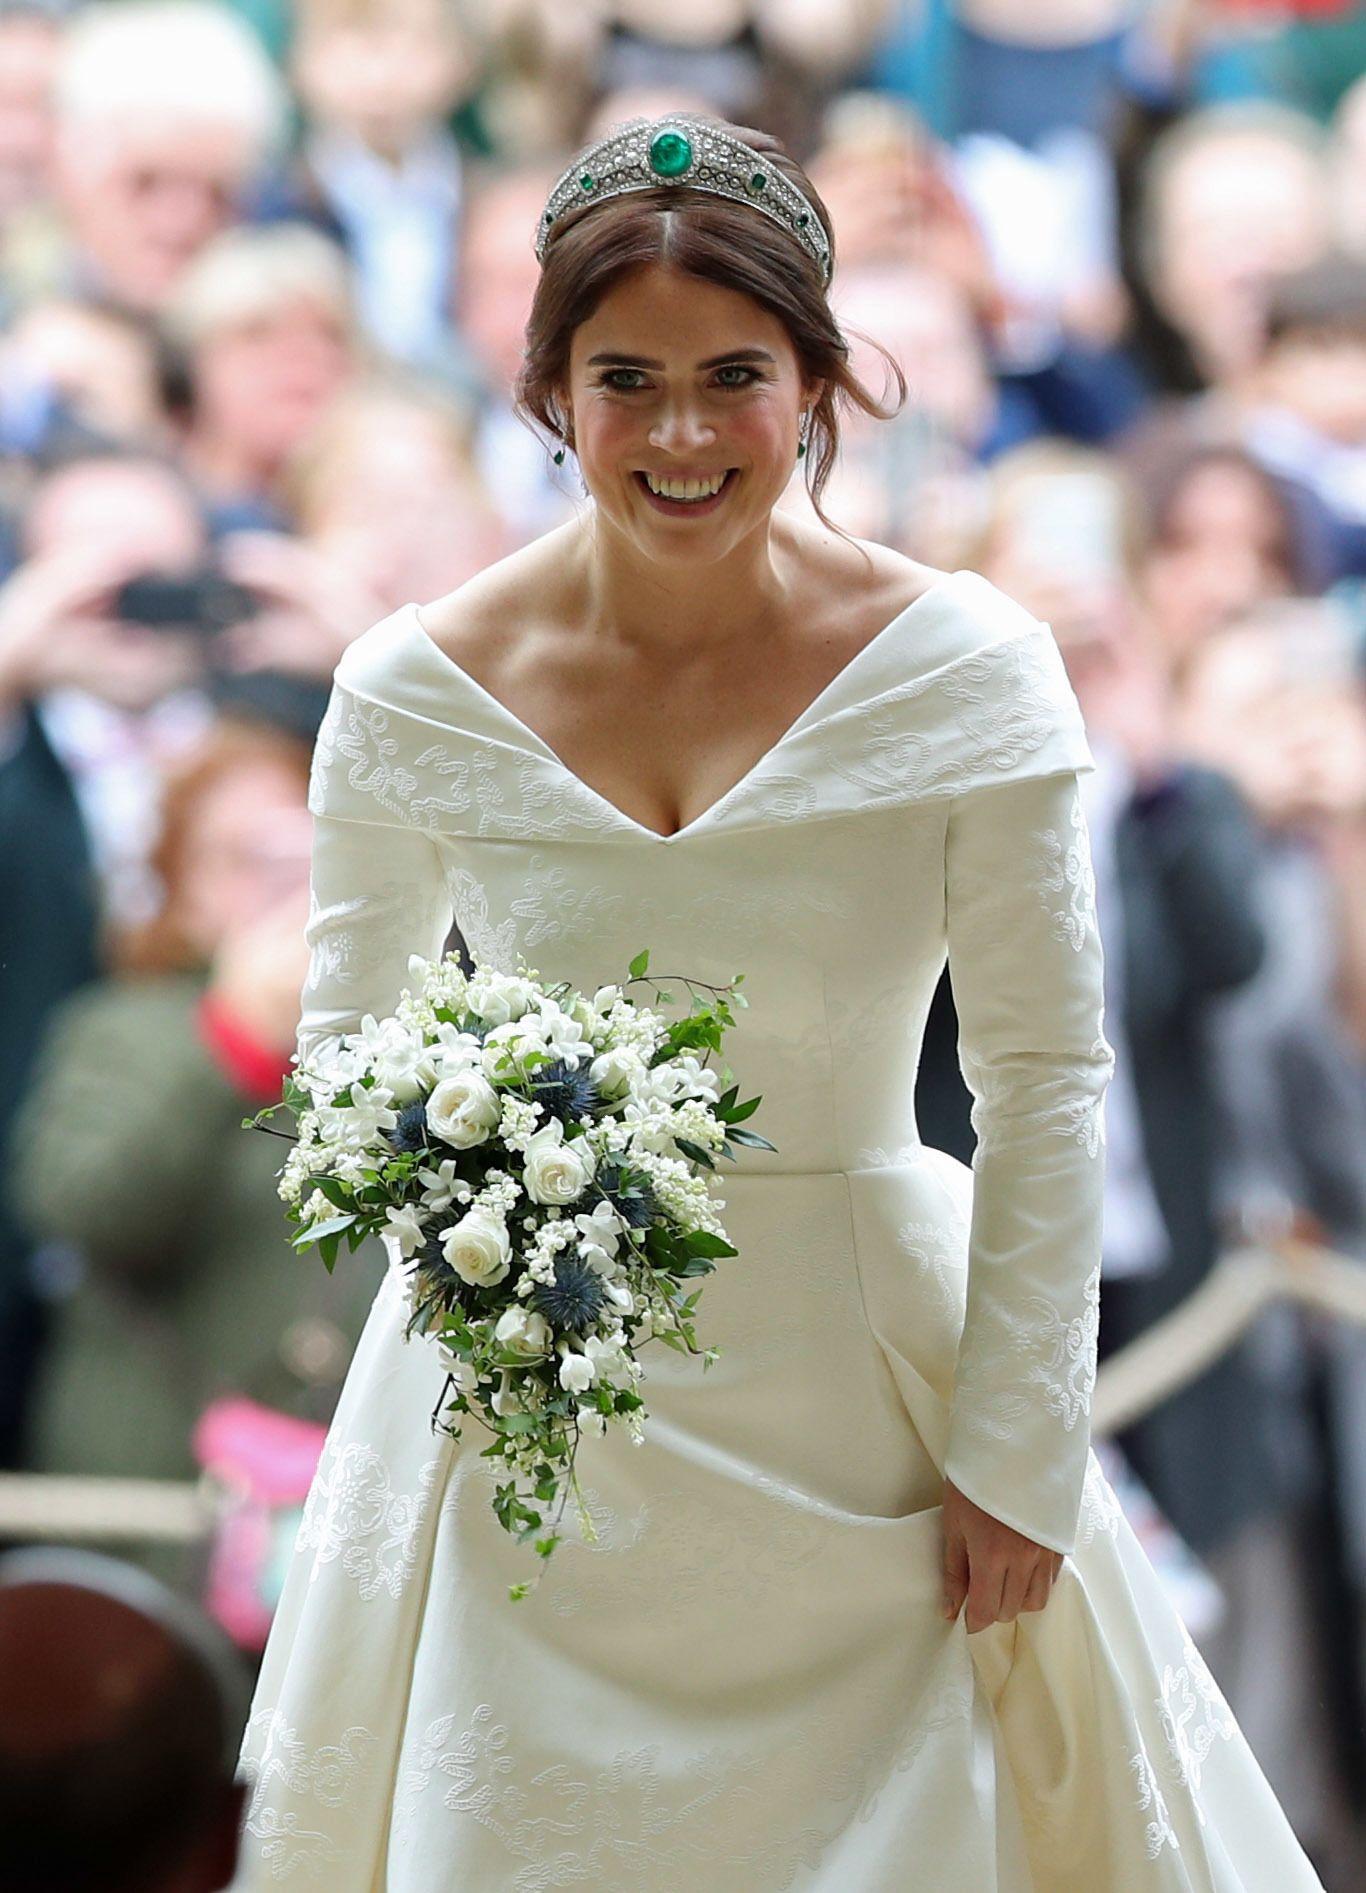 princess eugenie s wedding dress compared to meghan markle kate middleton princess diana s meghan markle kate middleton